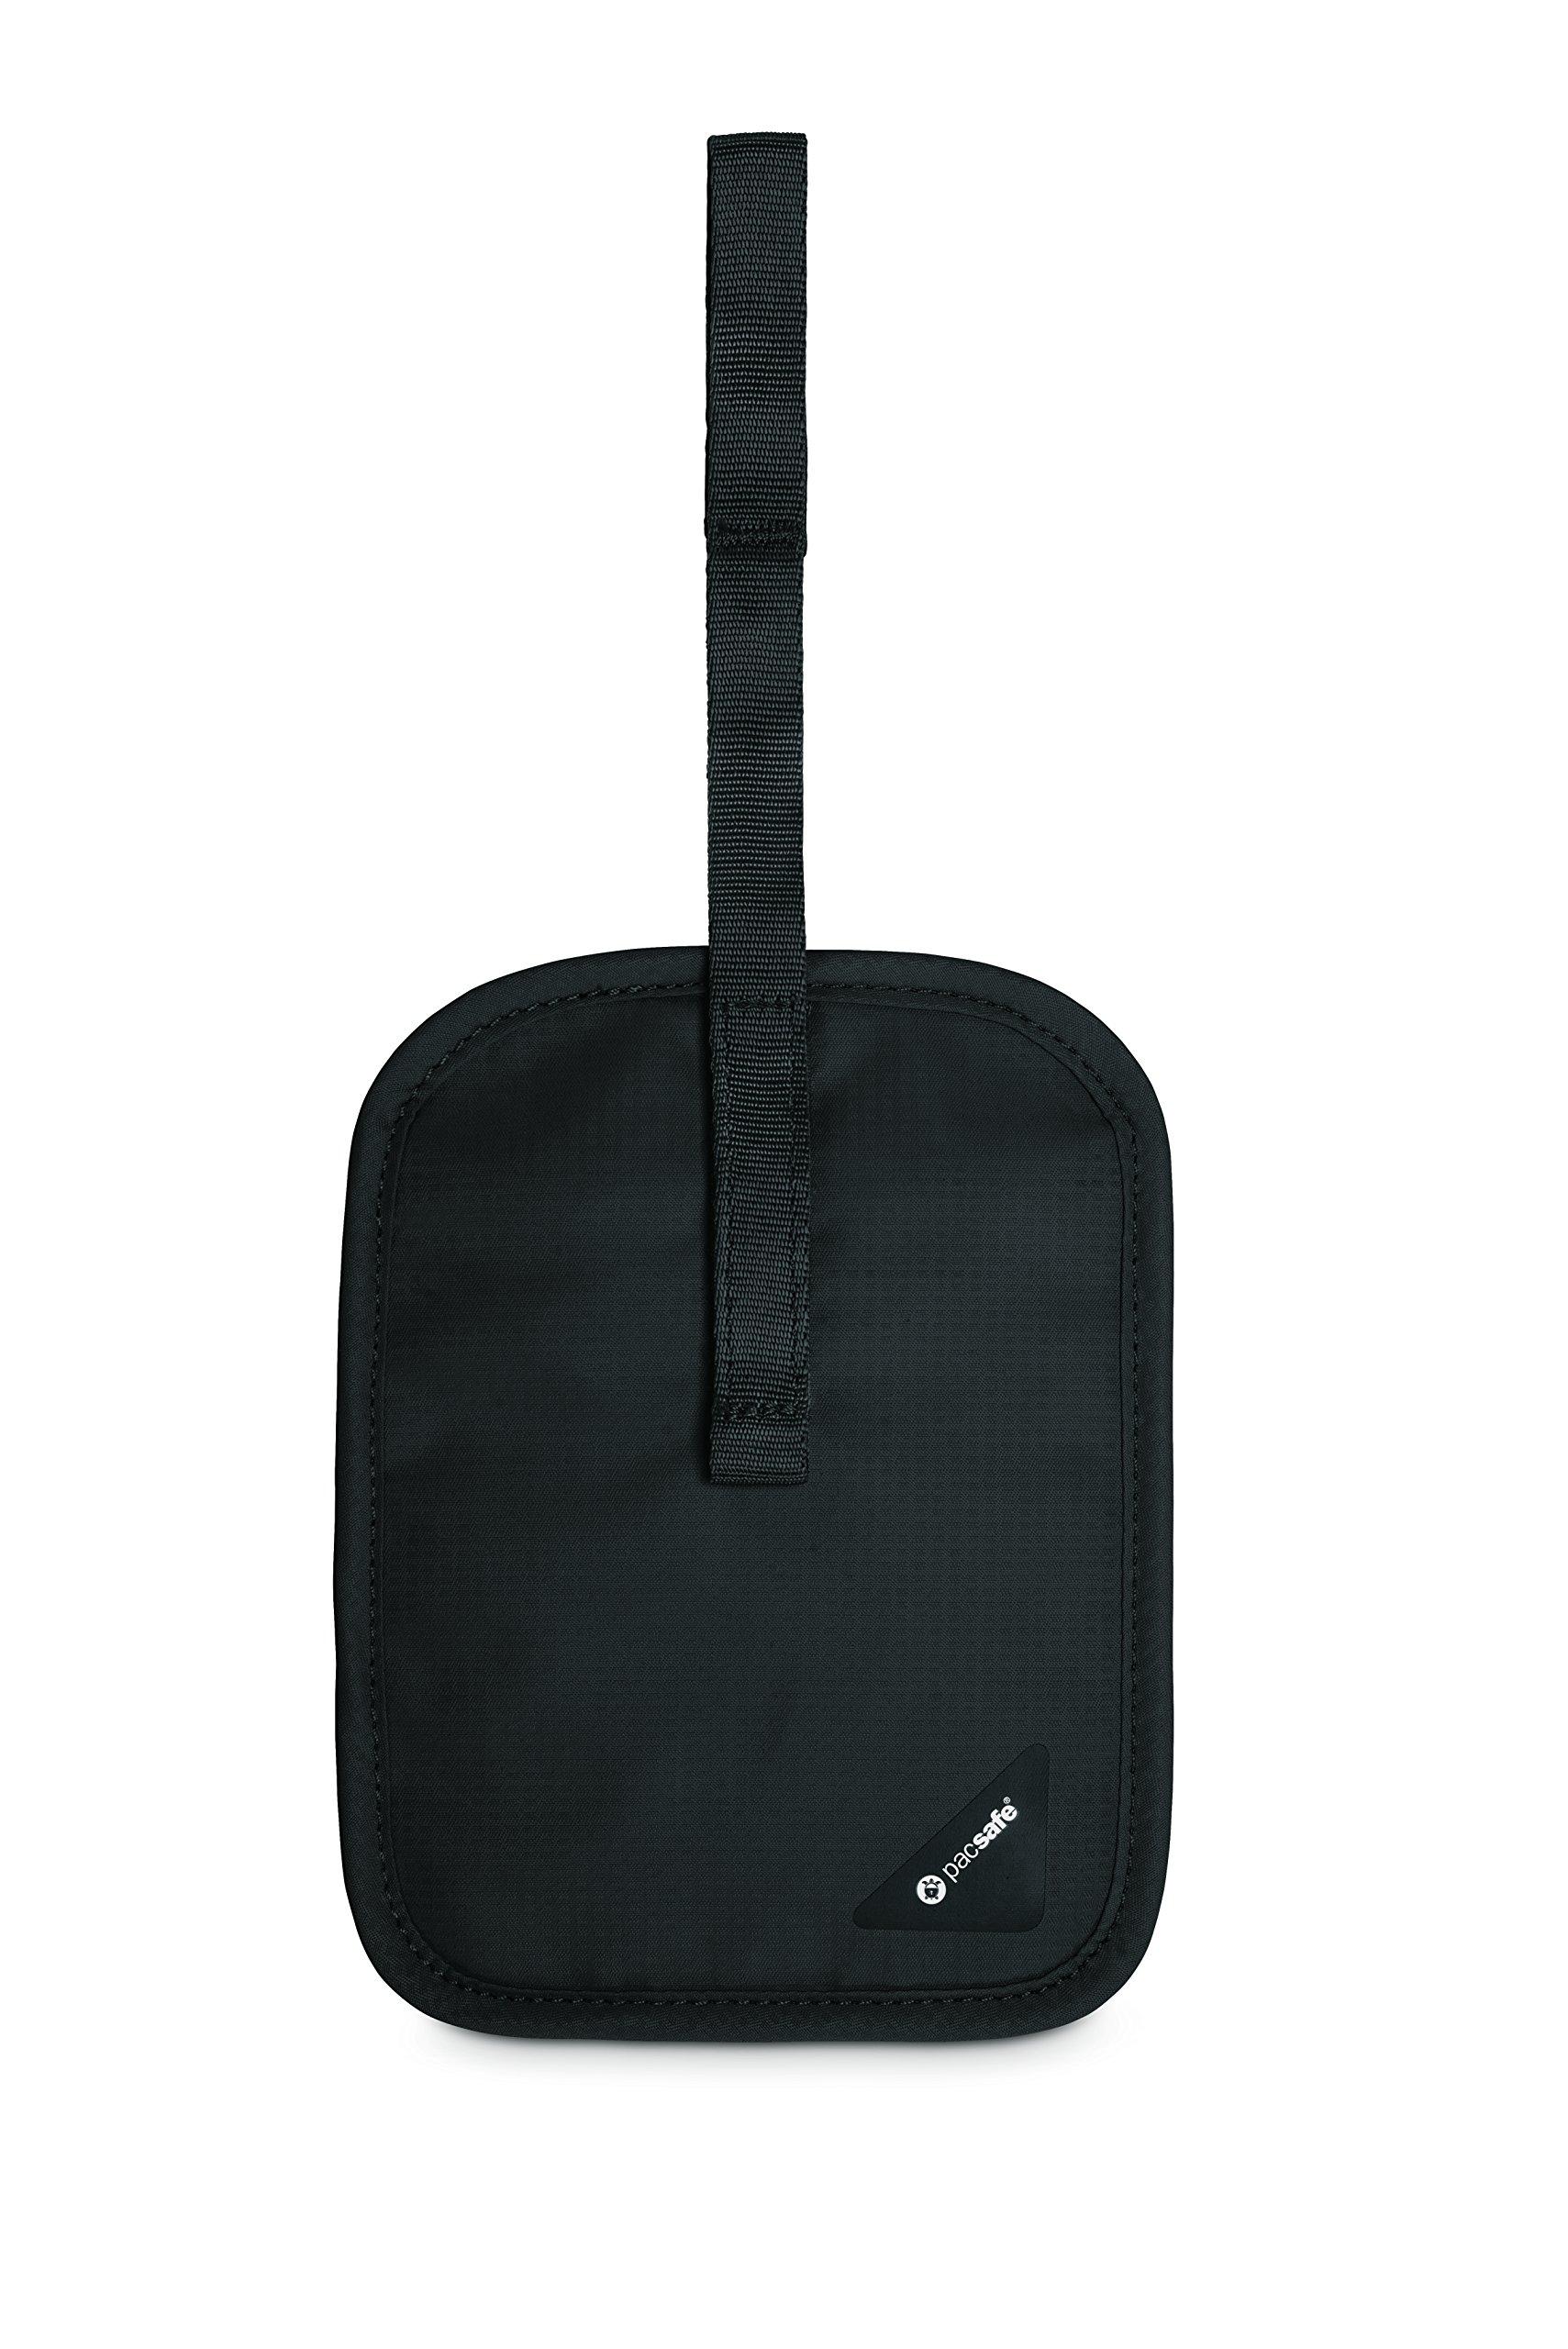 Pacsafe Coversafe V60 Anti-Theft RFID Blocking Secret Belt Wallet, Black by Pacsafe